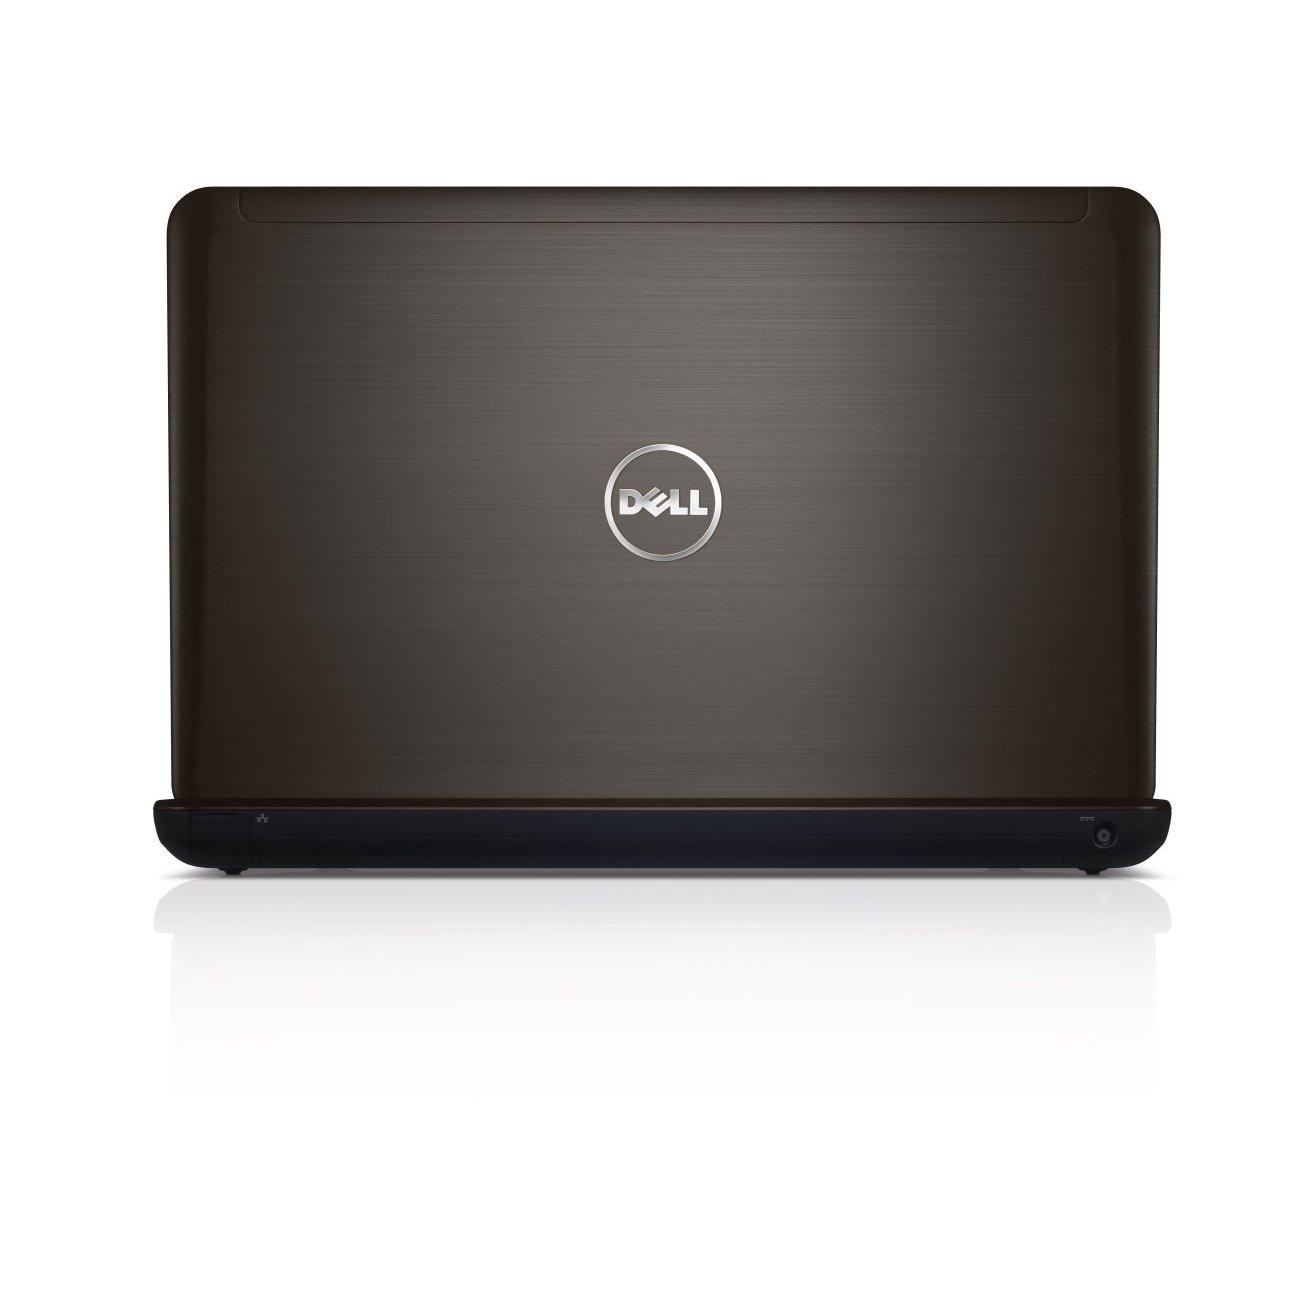 http://thetechjournal.com/wp-content/uploads/images/1204/1333304418-dell-inspiron-i14z2877bk-14inch-laptop-5.jpg